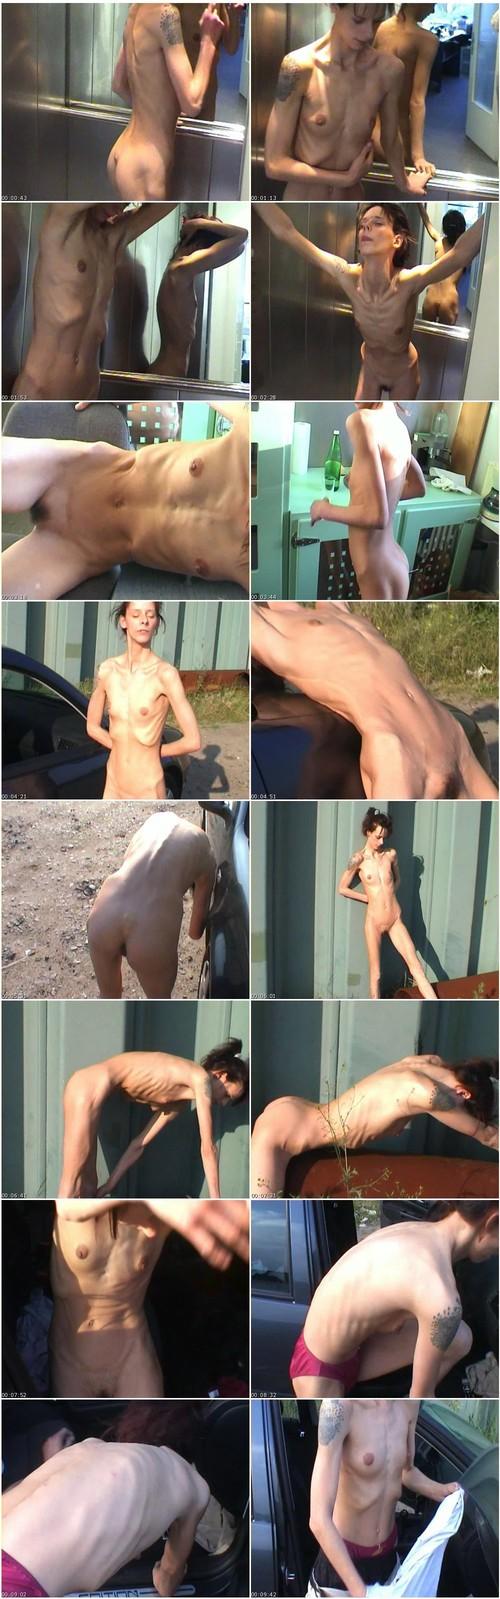 http://ist5-1.filesor.com/pimpandhost.com/9/6/8/3/96838/6/g/4/A/6g4A6/Anorexia-b175_thumb_m.jpg